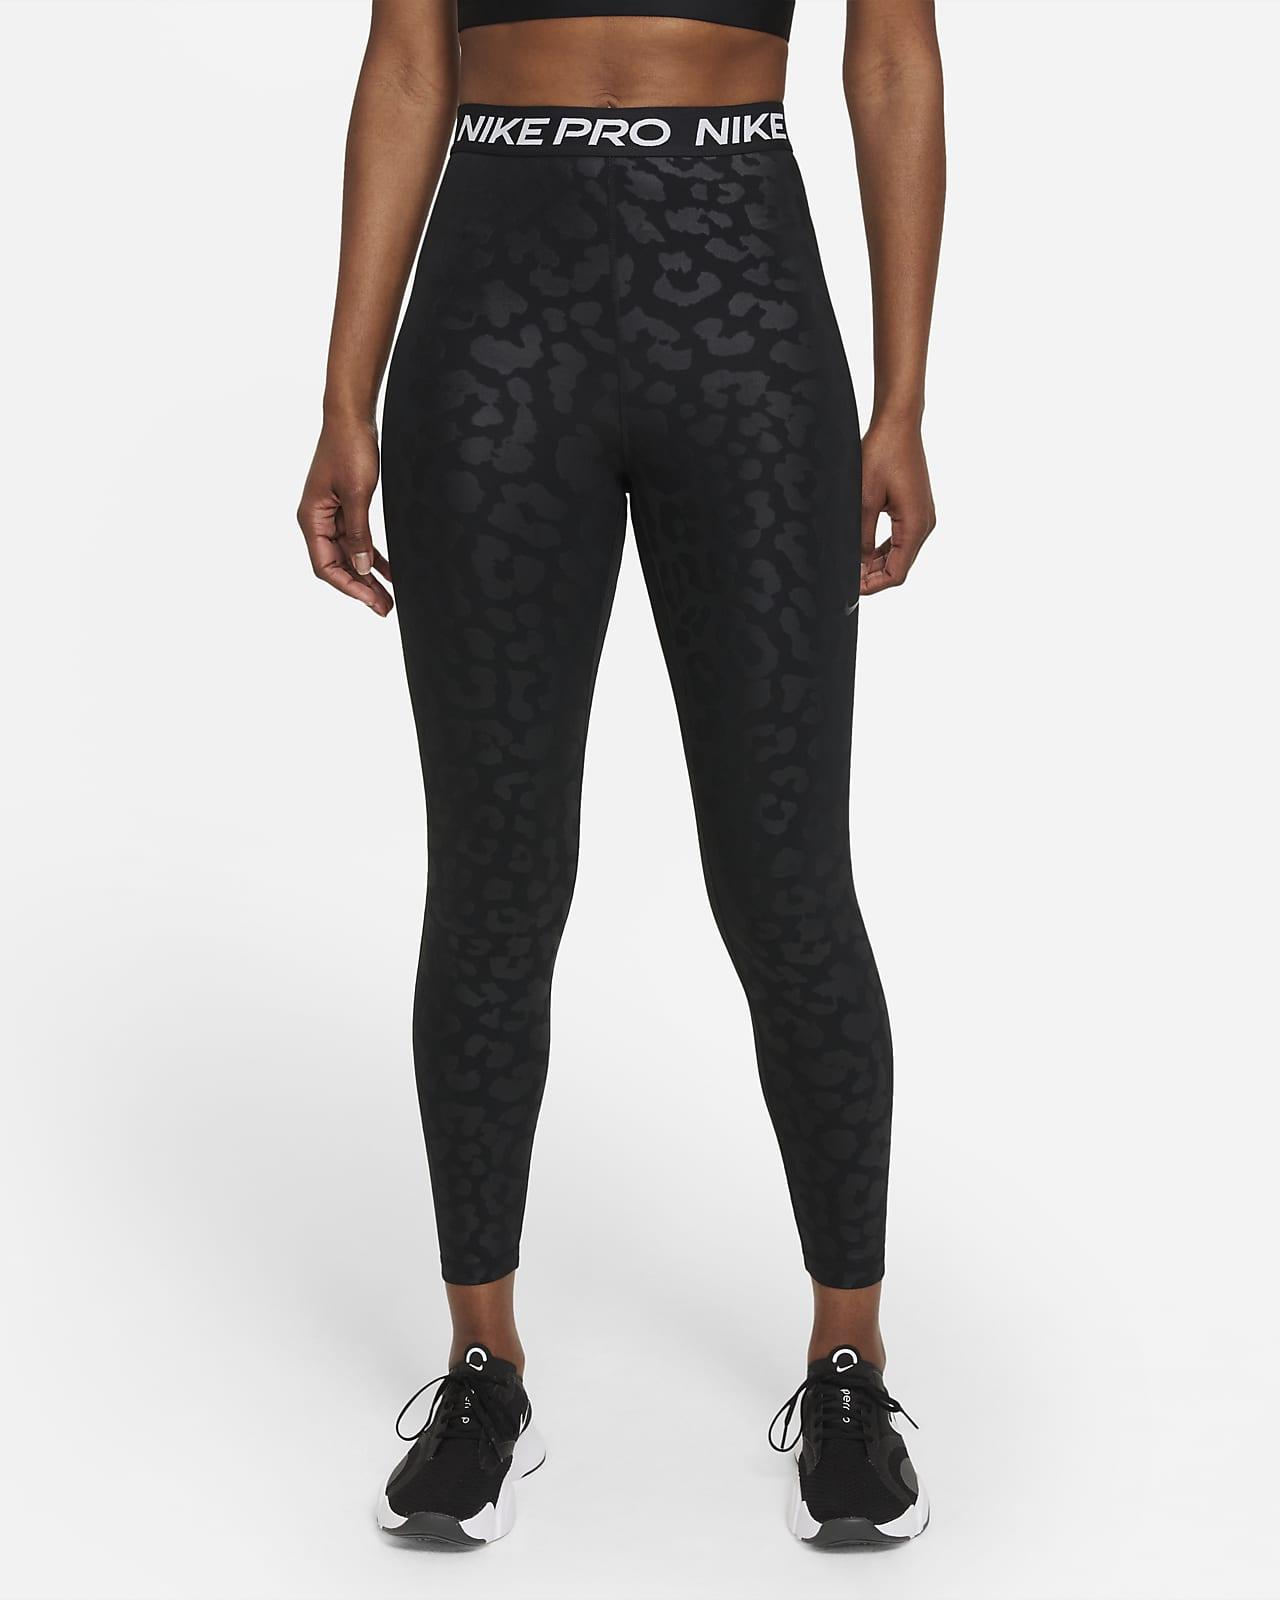 Nike Pro Dri-FIT Women's High-Waisted 7/8 Printed Leggings